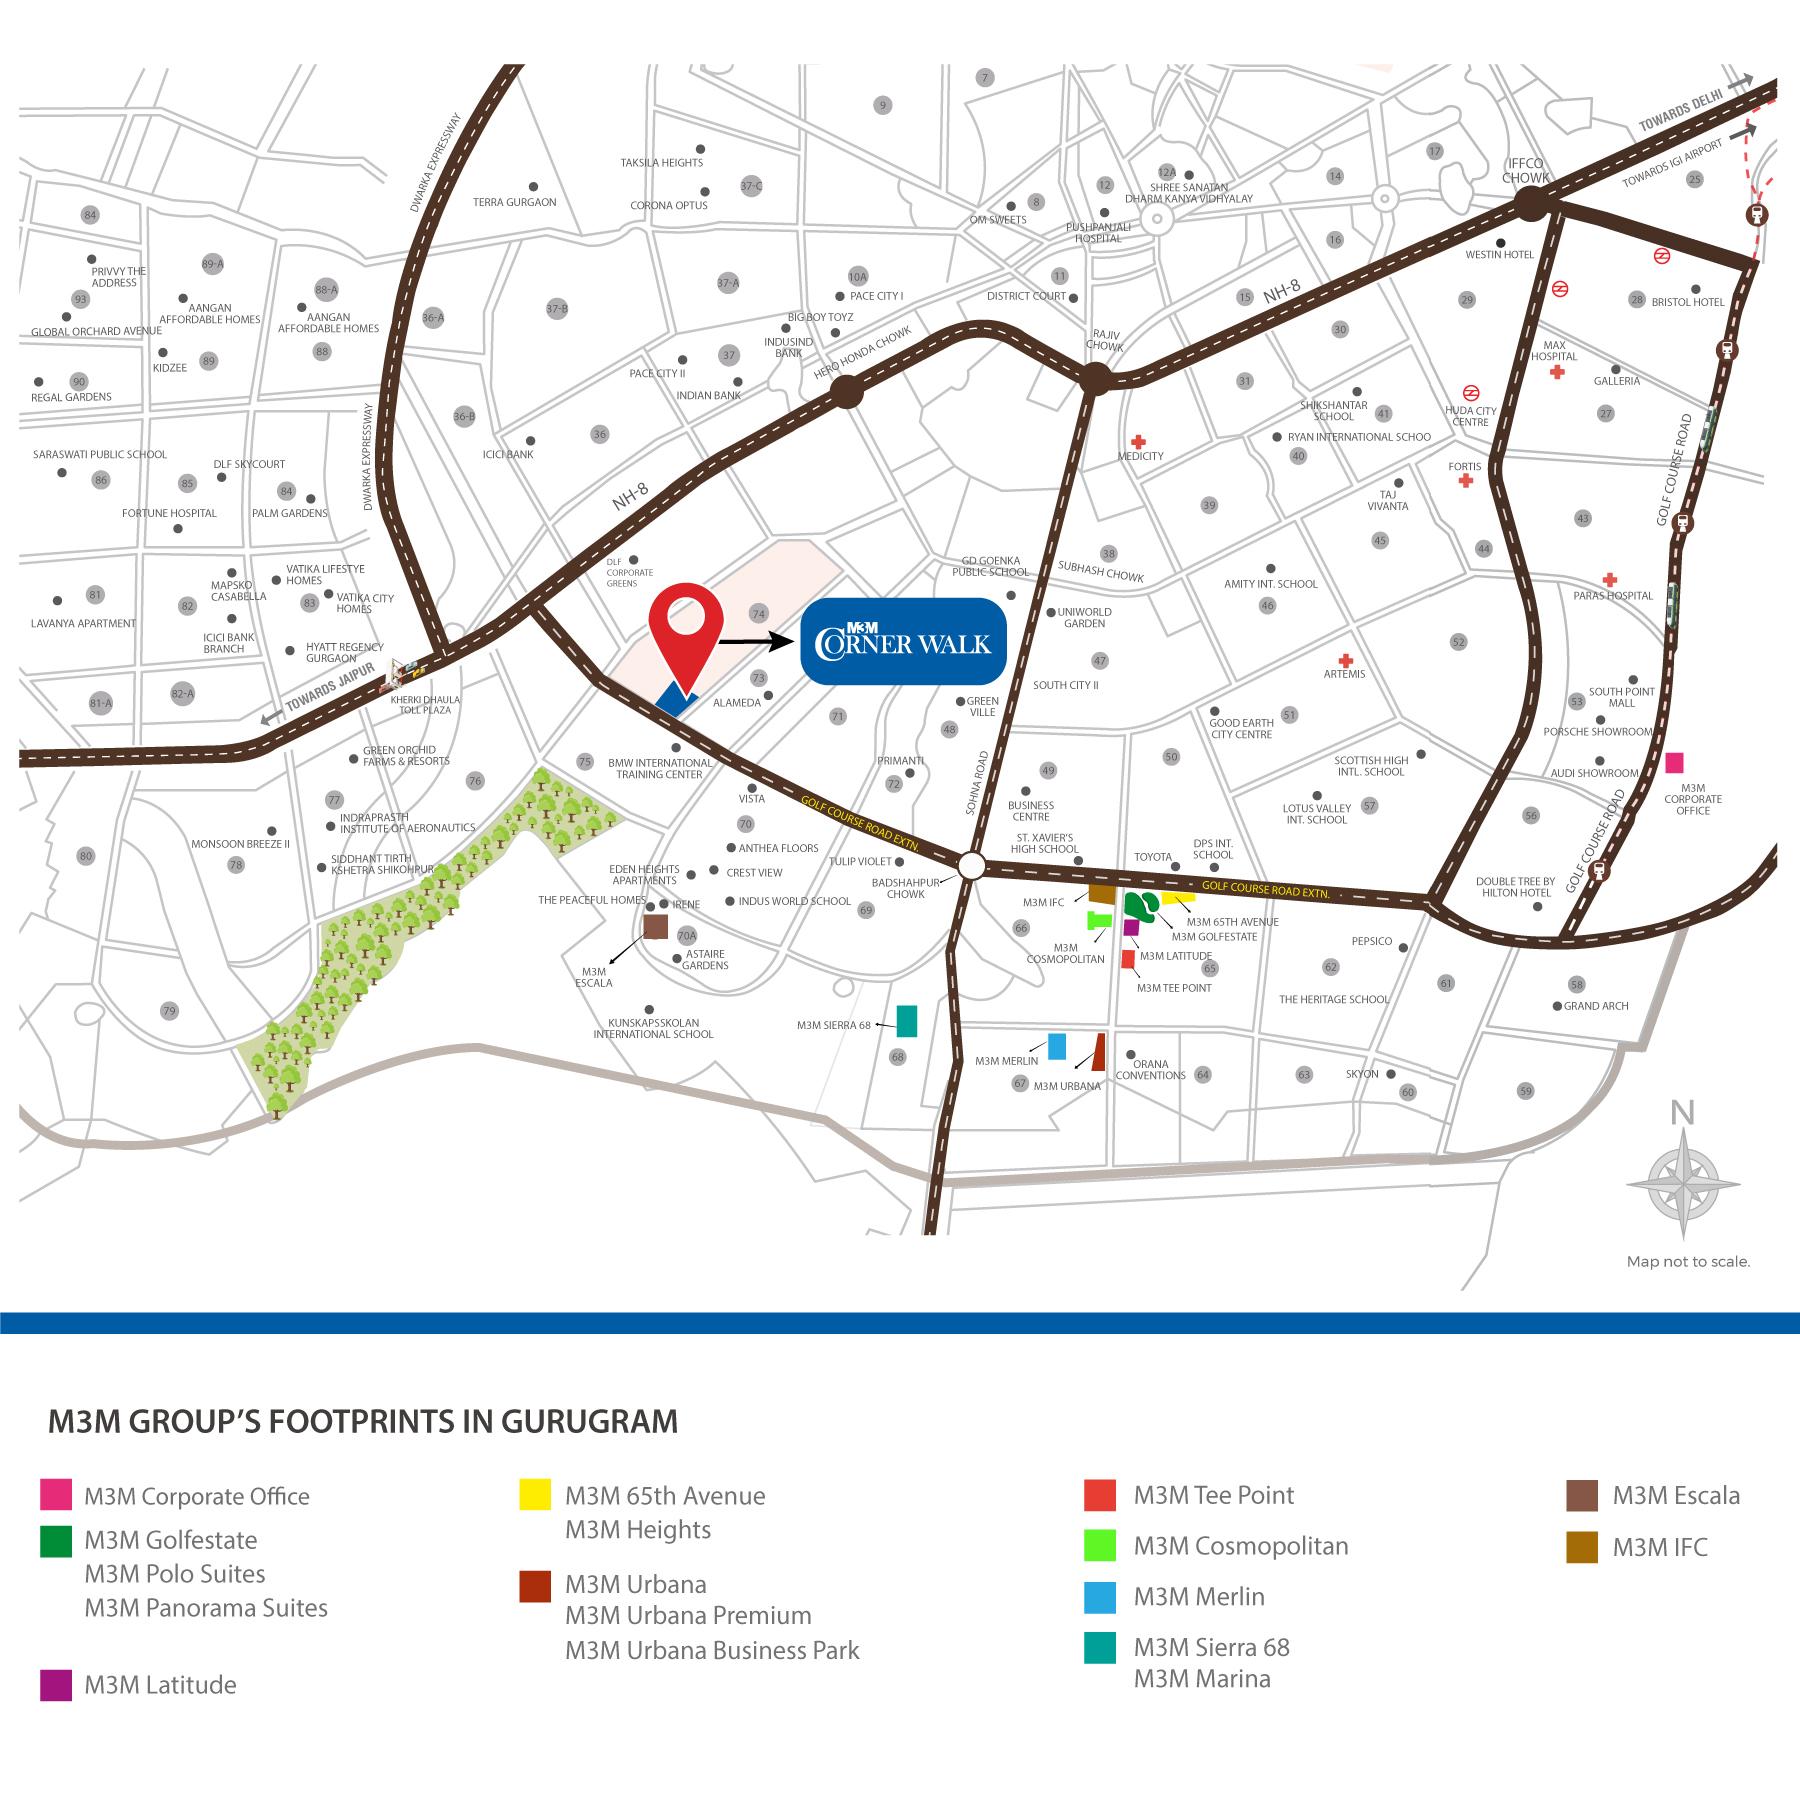 m3m-corner-walk-location-map